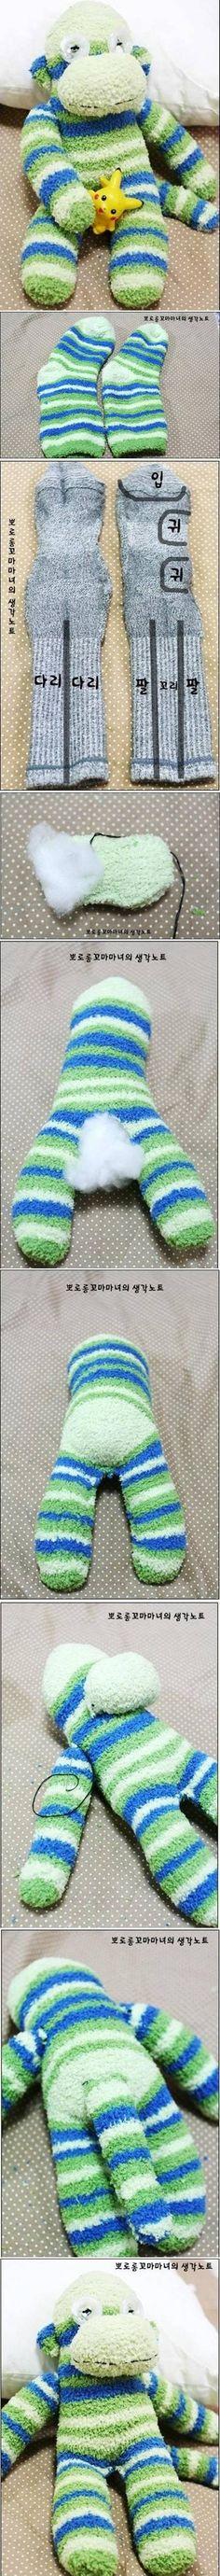 DIY Sock Monkey Terry DIY Sock Monkey Terry